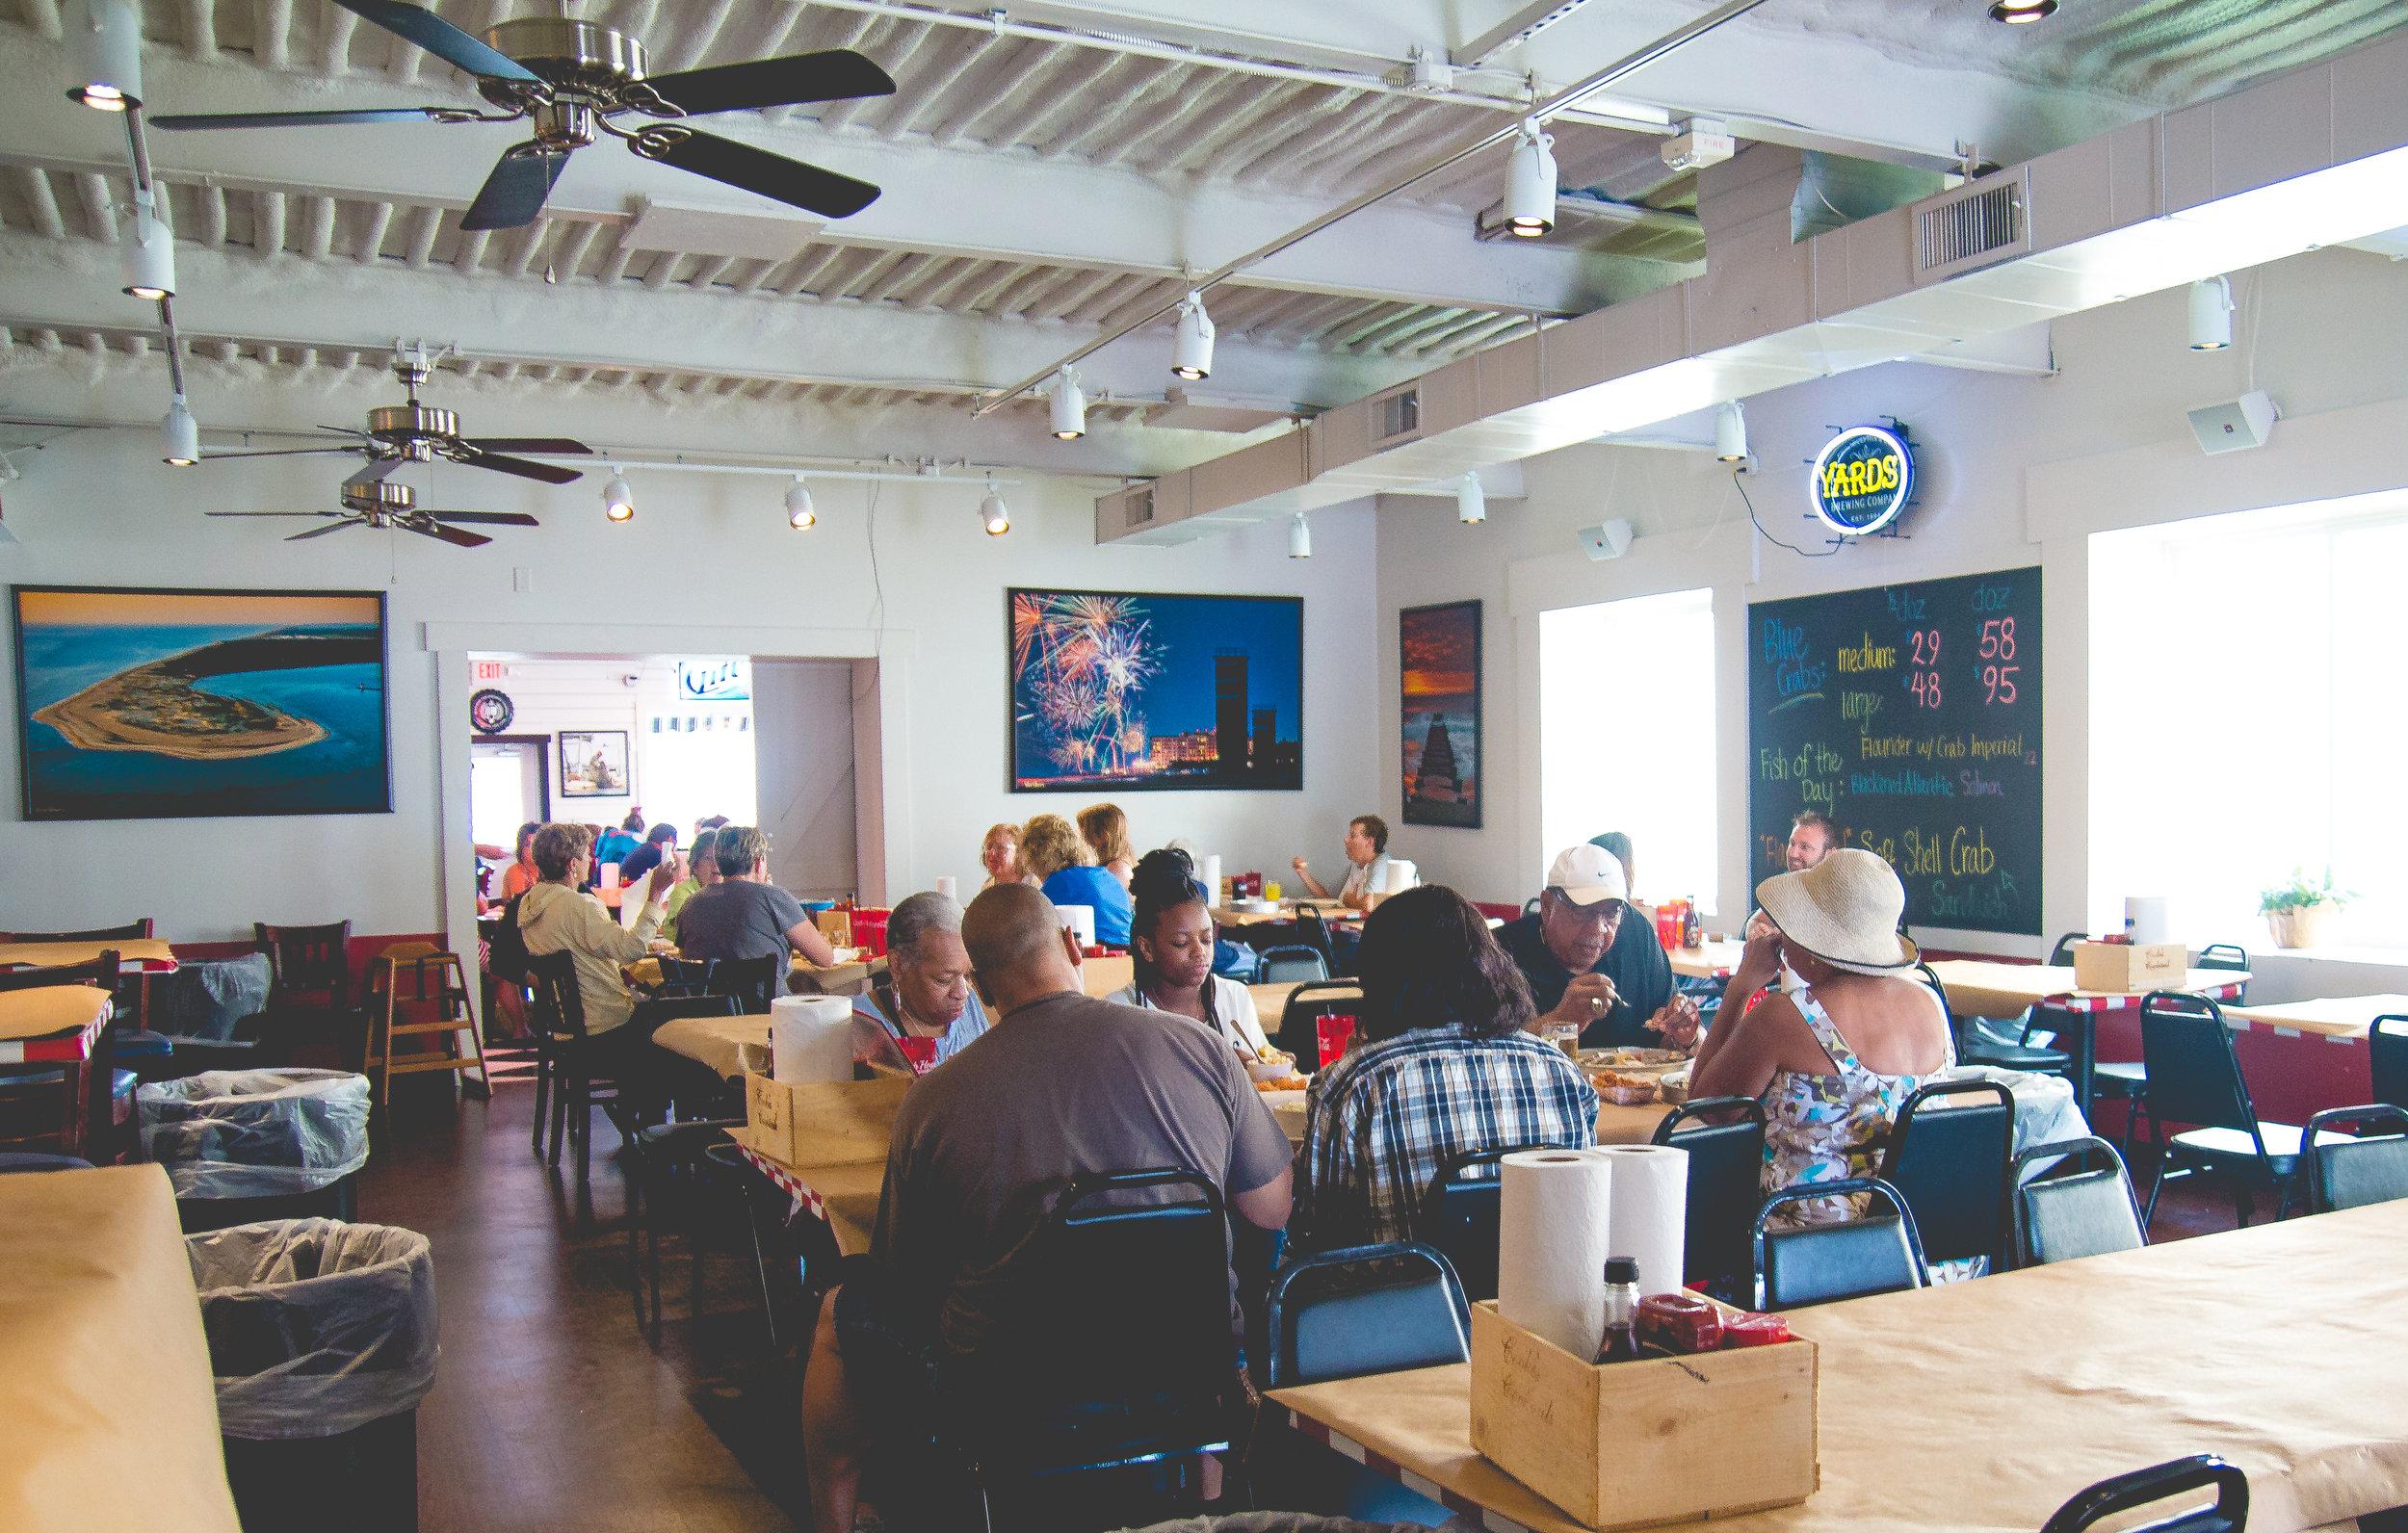 crabfeast room with people.jpg